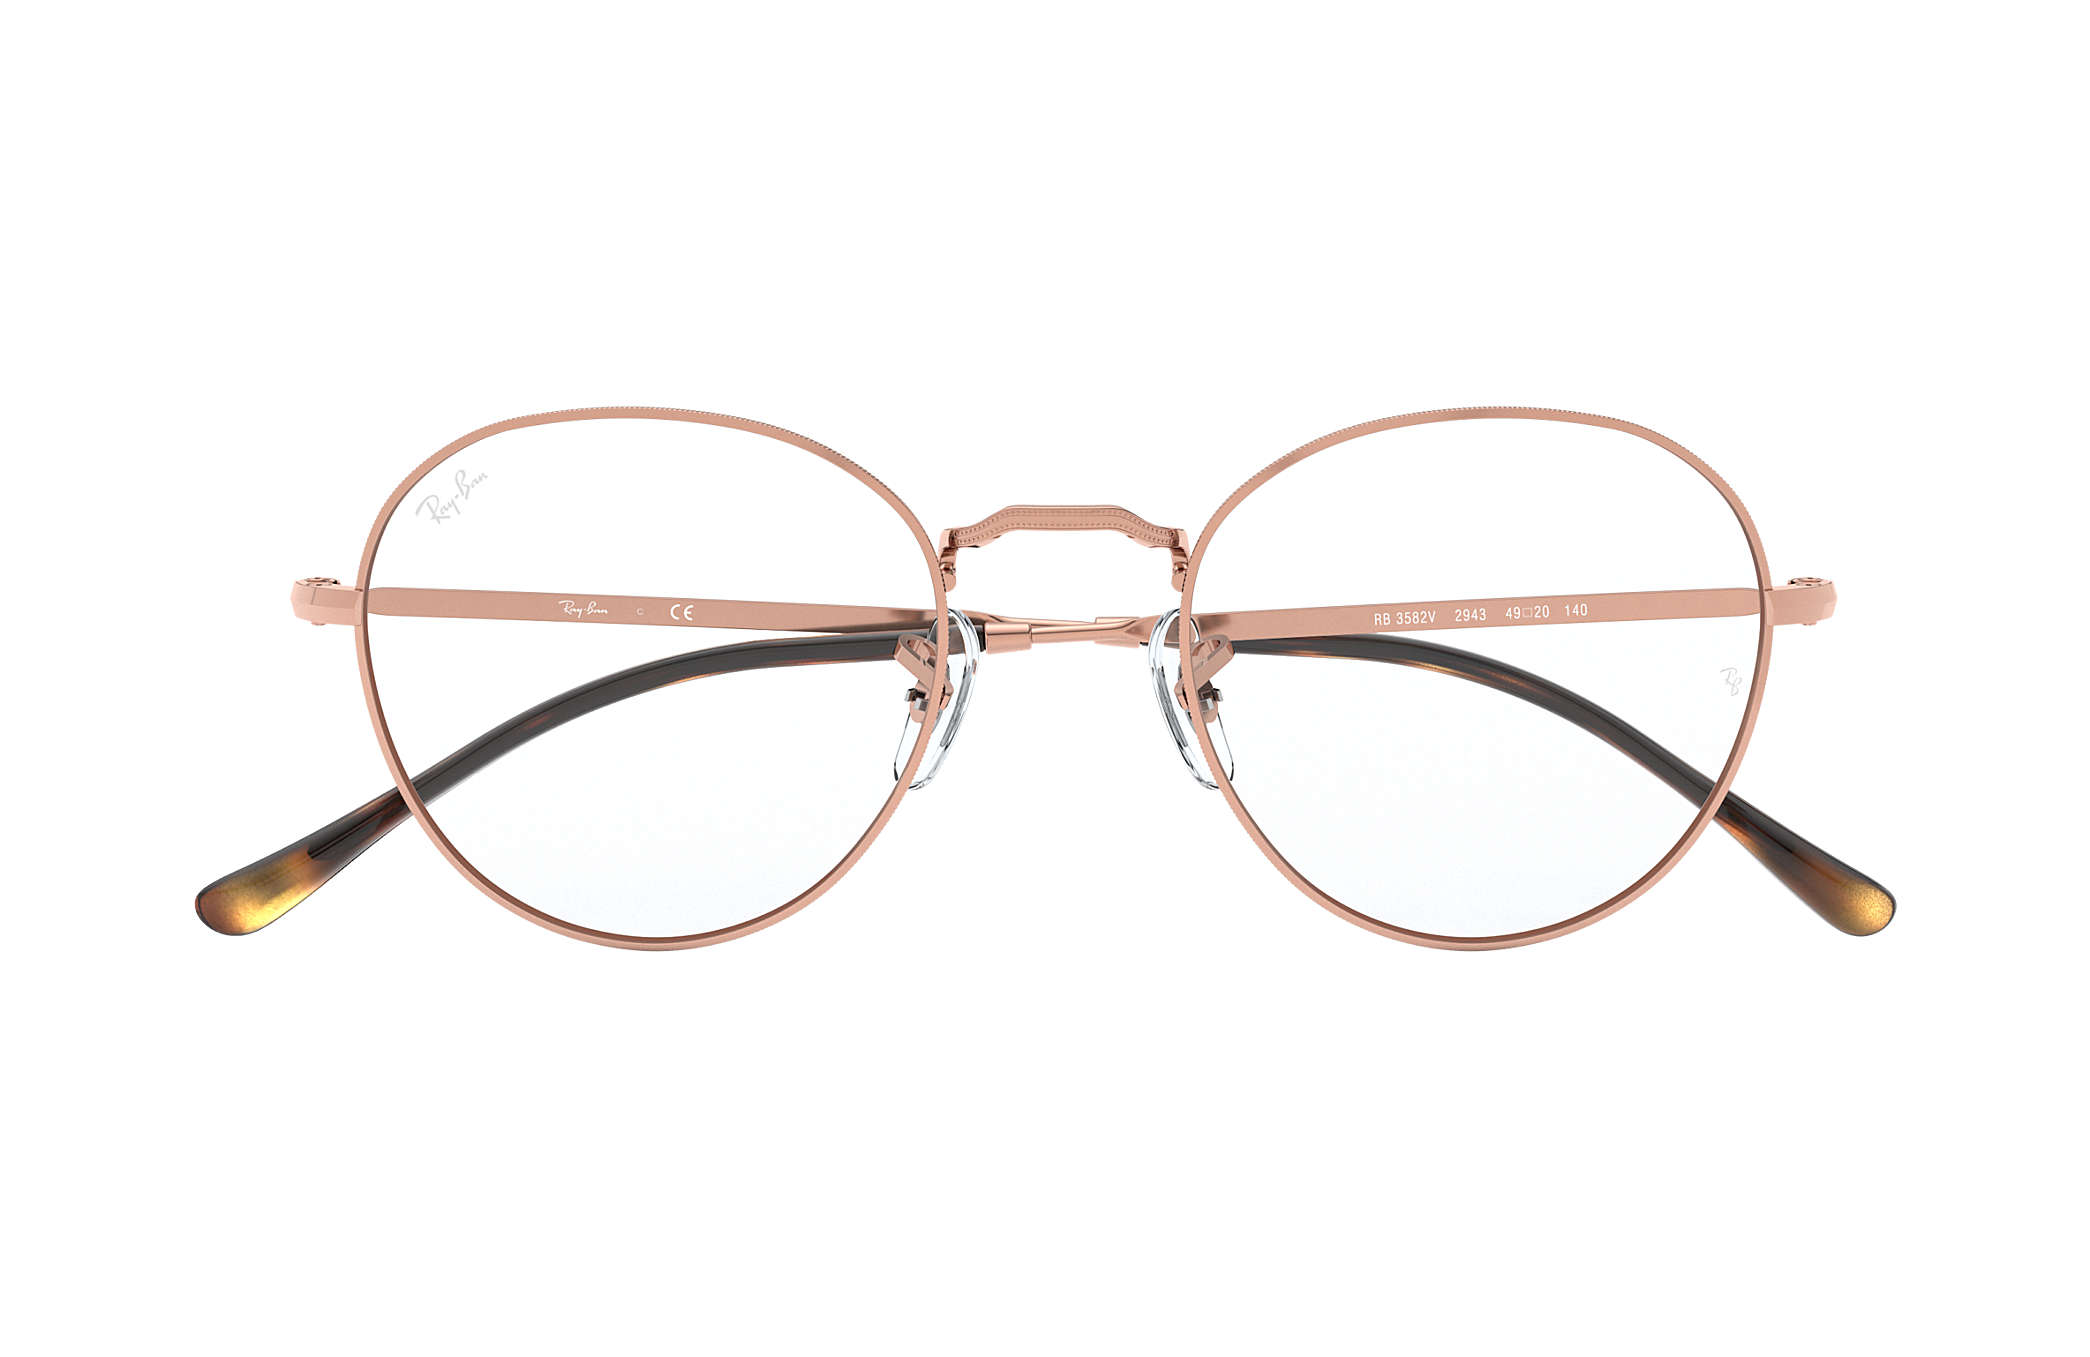 c526194f1a Ray-Ban eyeglasses RB3582V Bronze-Copper - Metal - 0RX3582V294351 ...